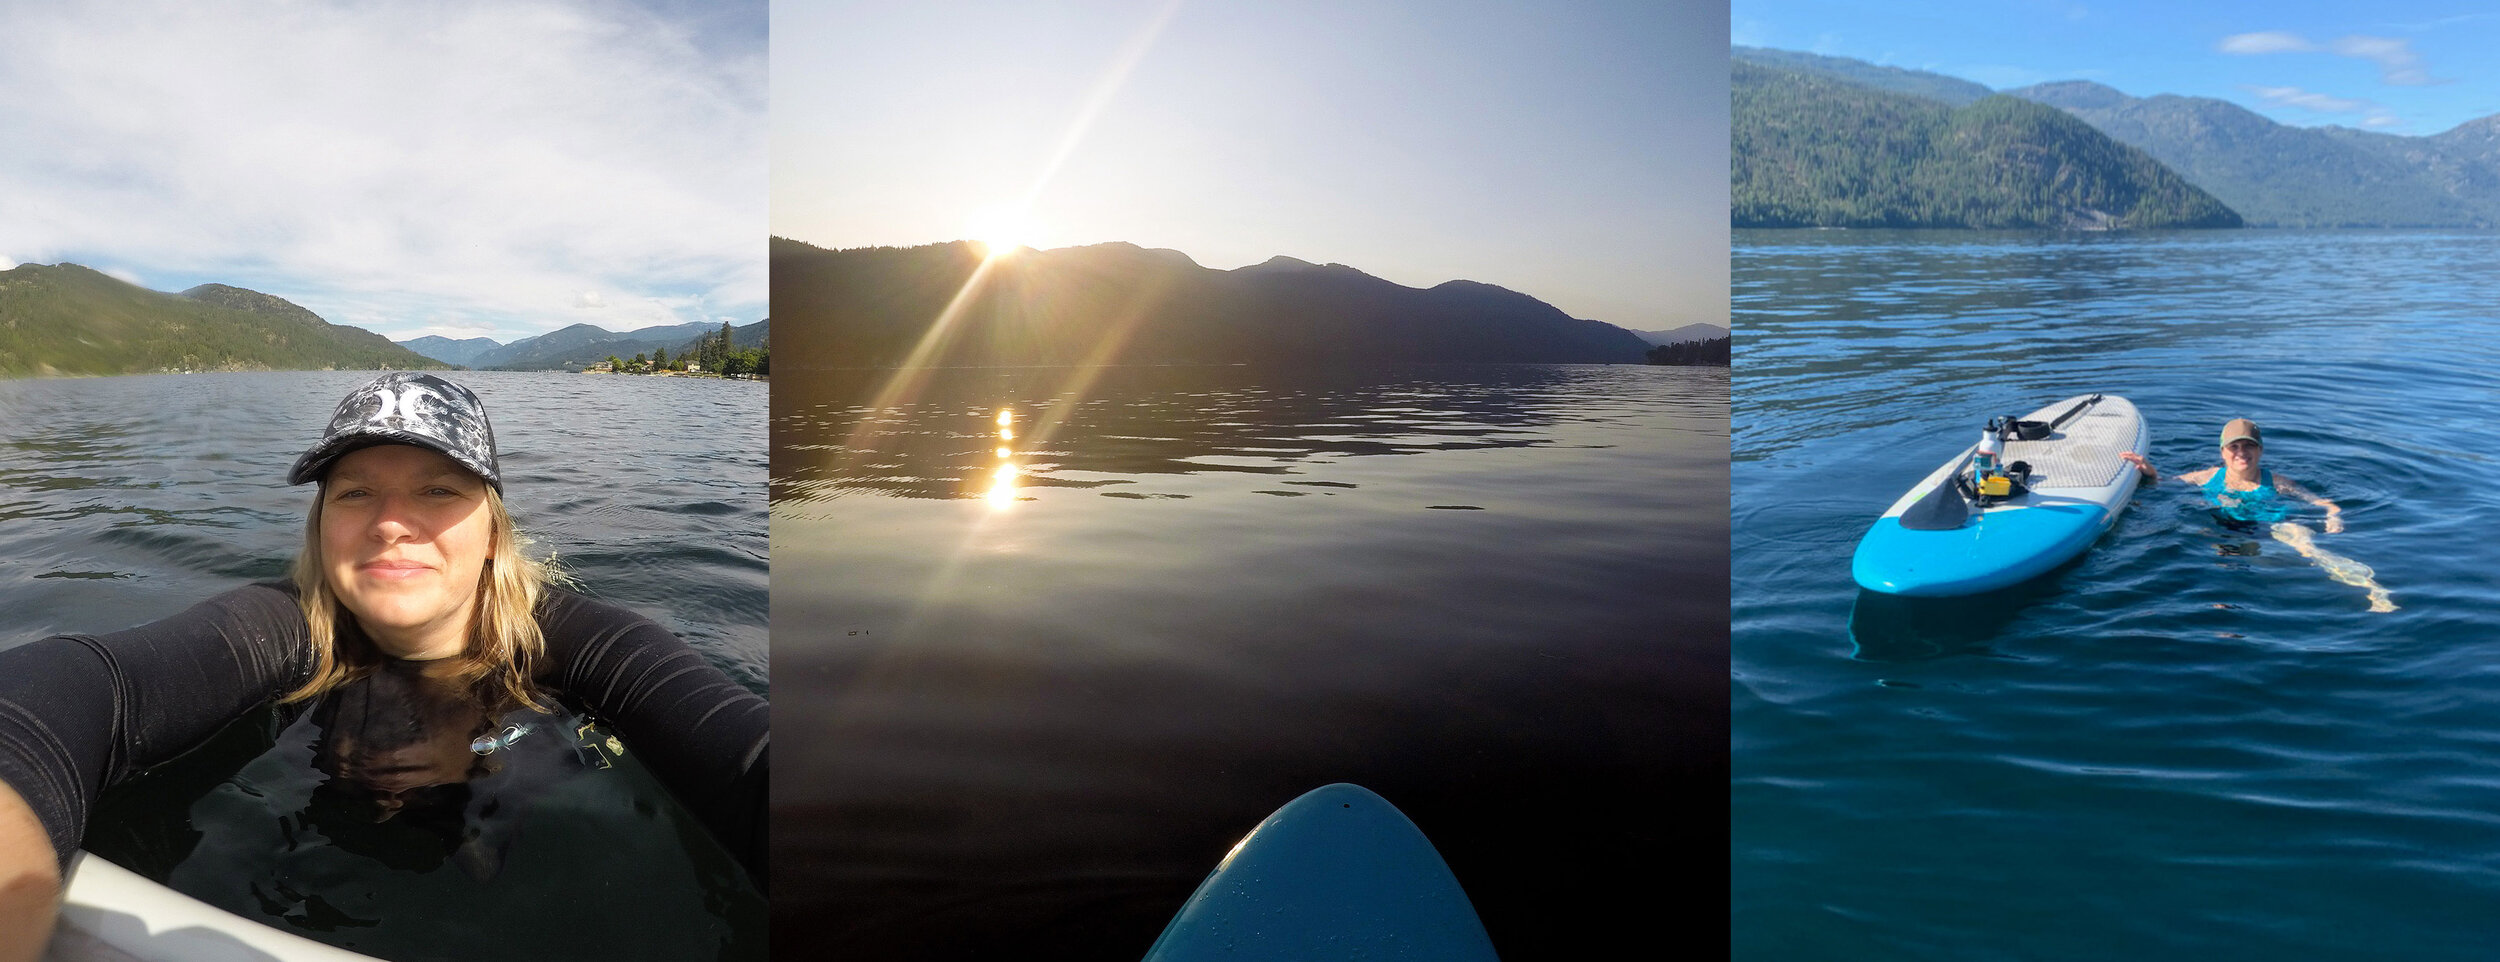 June 21 dip to September 21 dip. An August sunset in between.